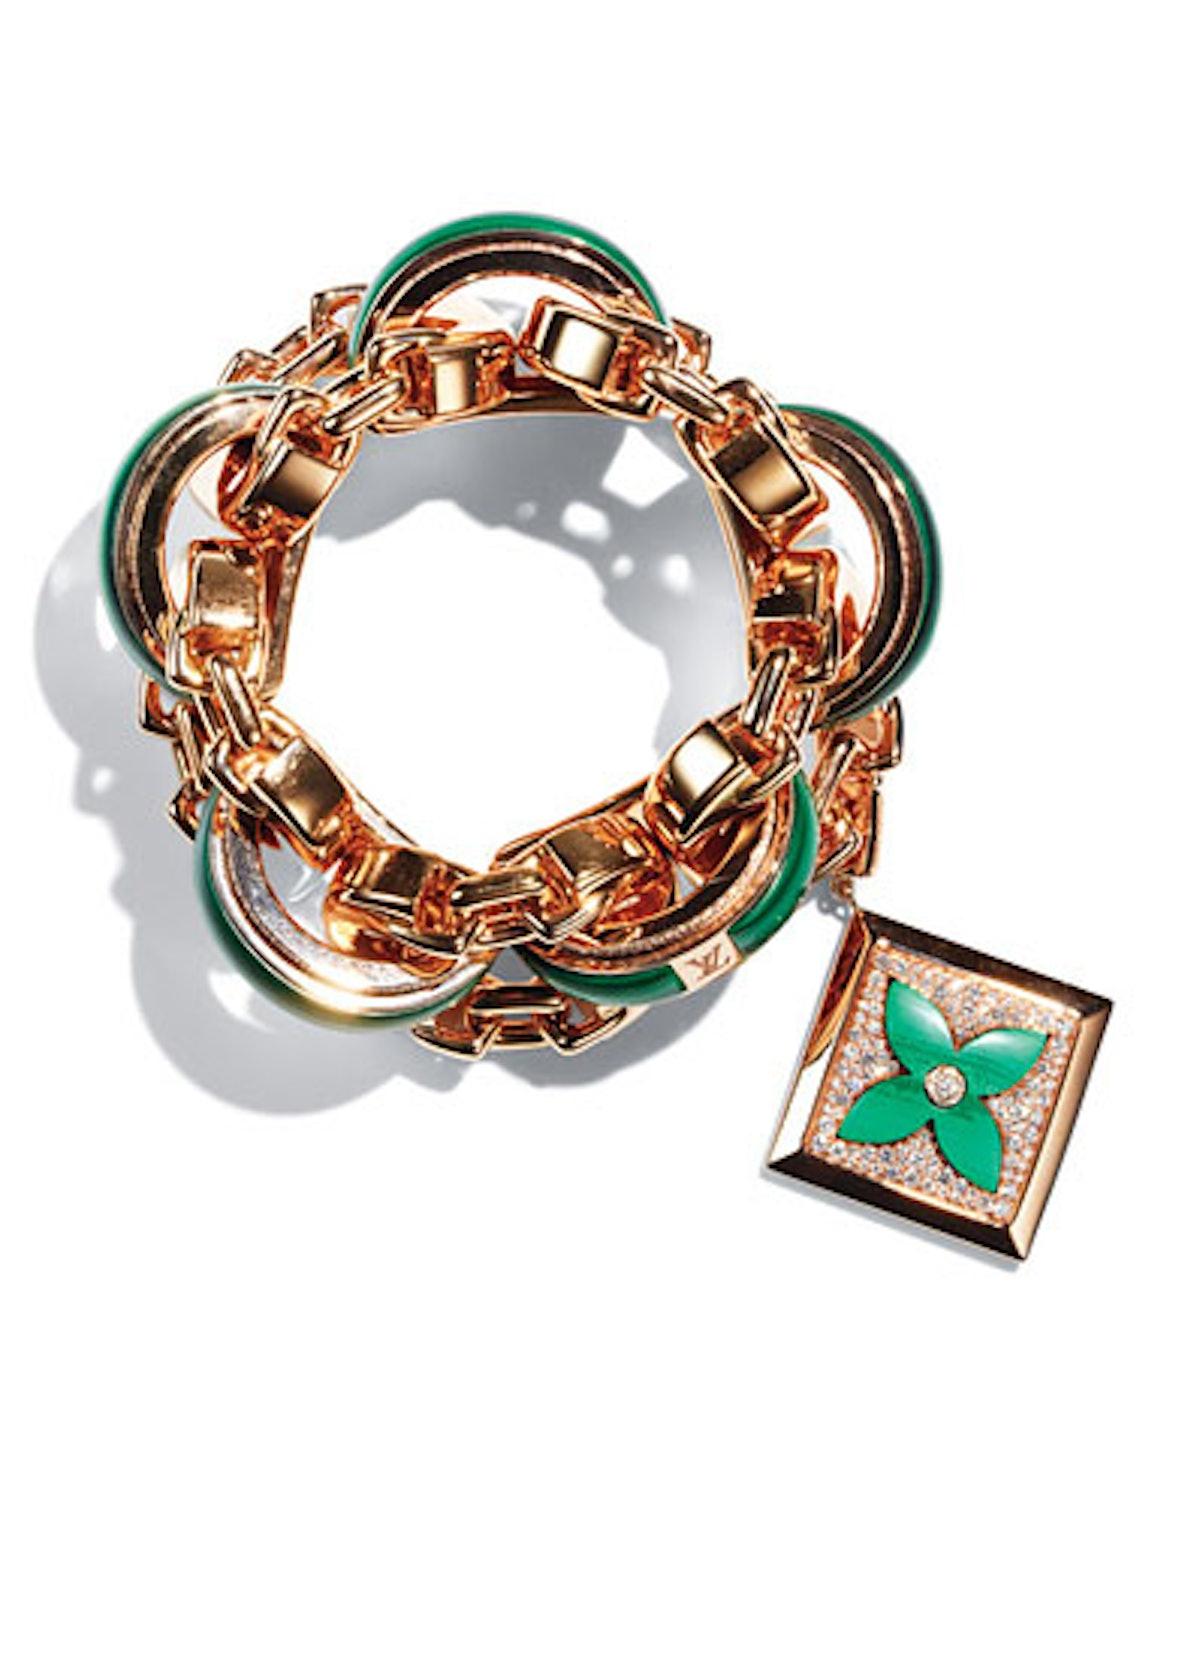 acss-claudias-jewelry-box-may-2012-01-v.jpg